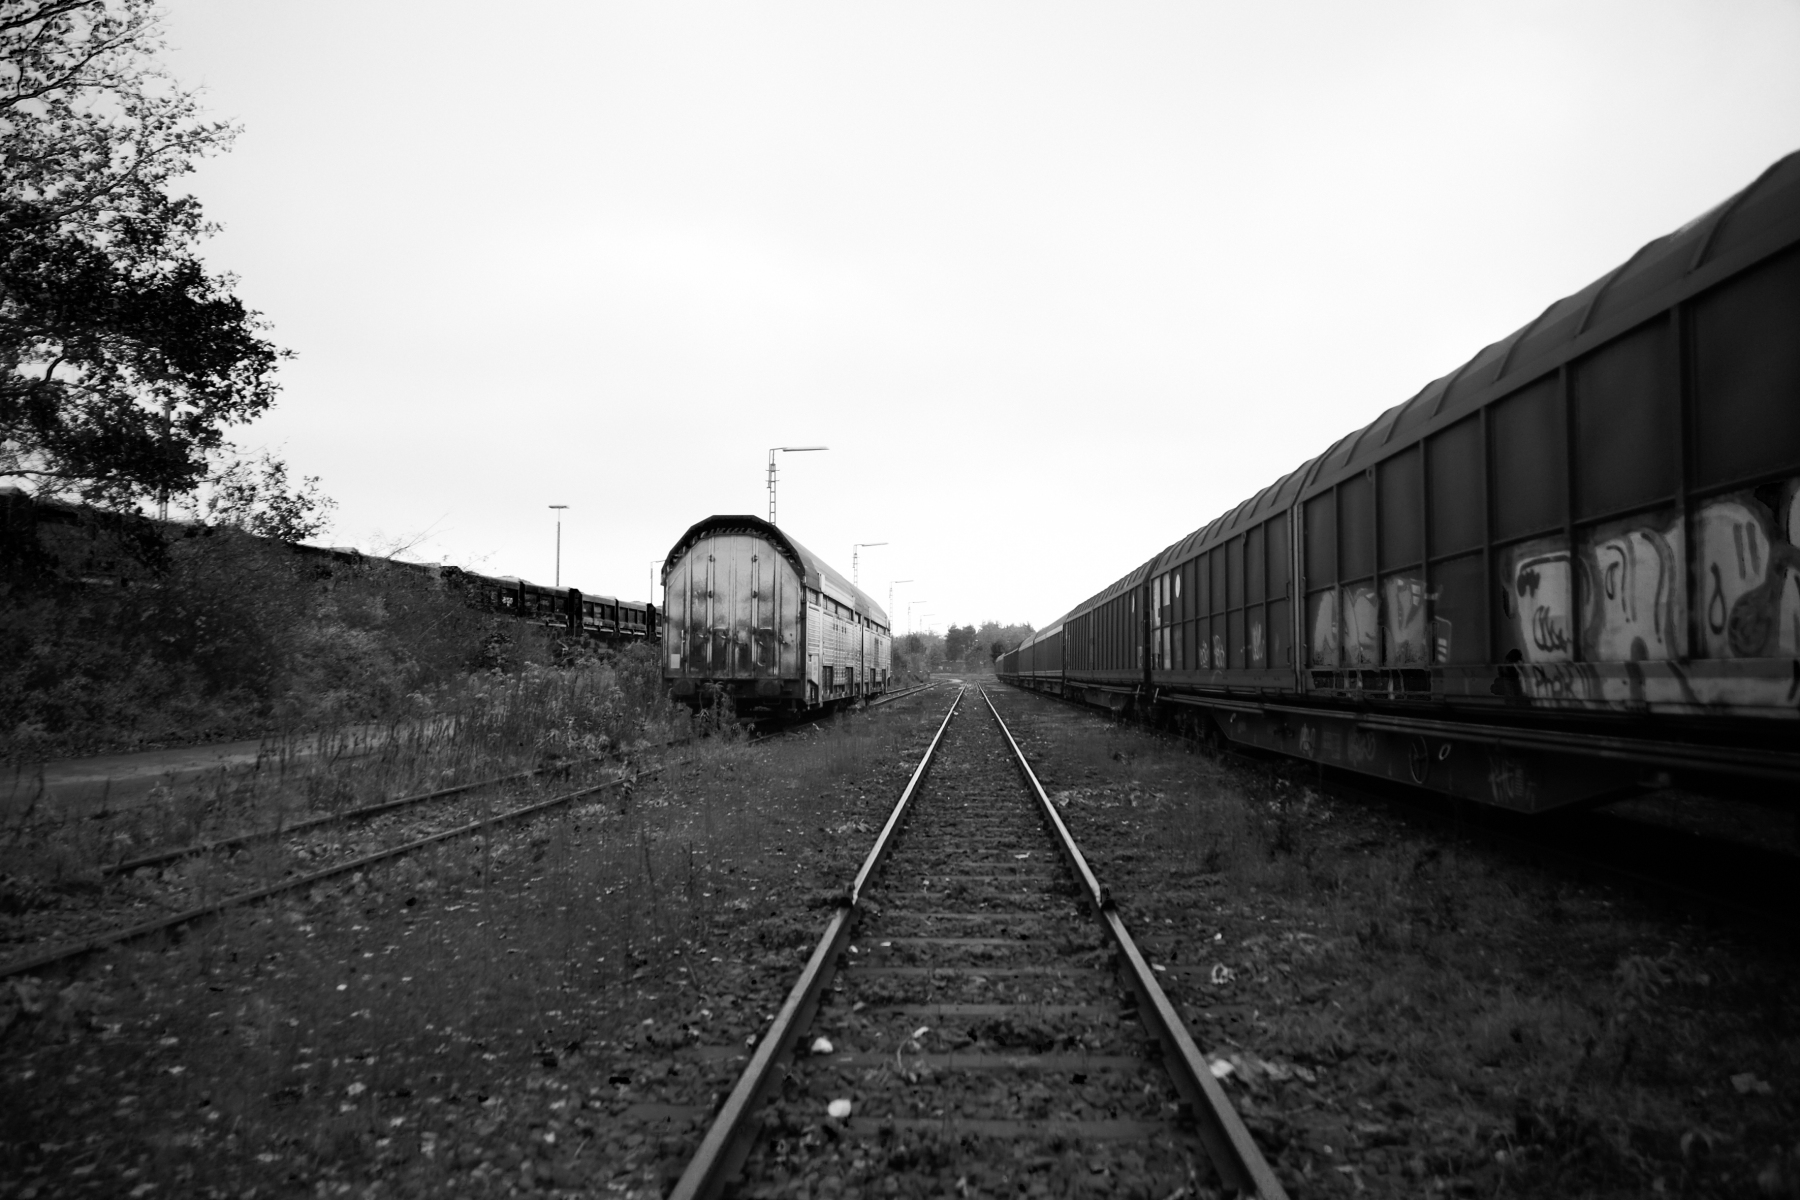 Praktikum_Fotografie_Verena_Bidman_Bahnhof